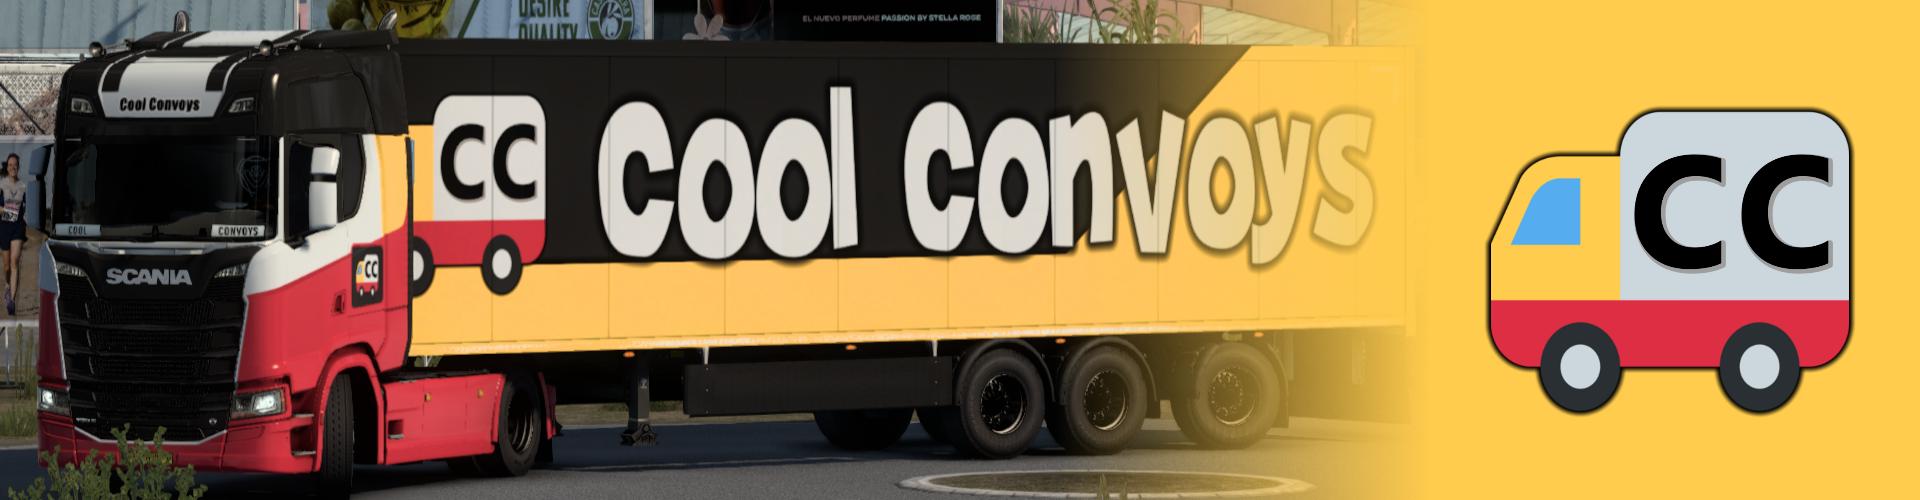 Cool Convoy #32